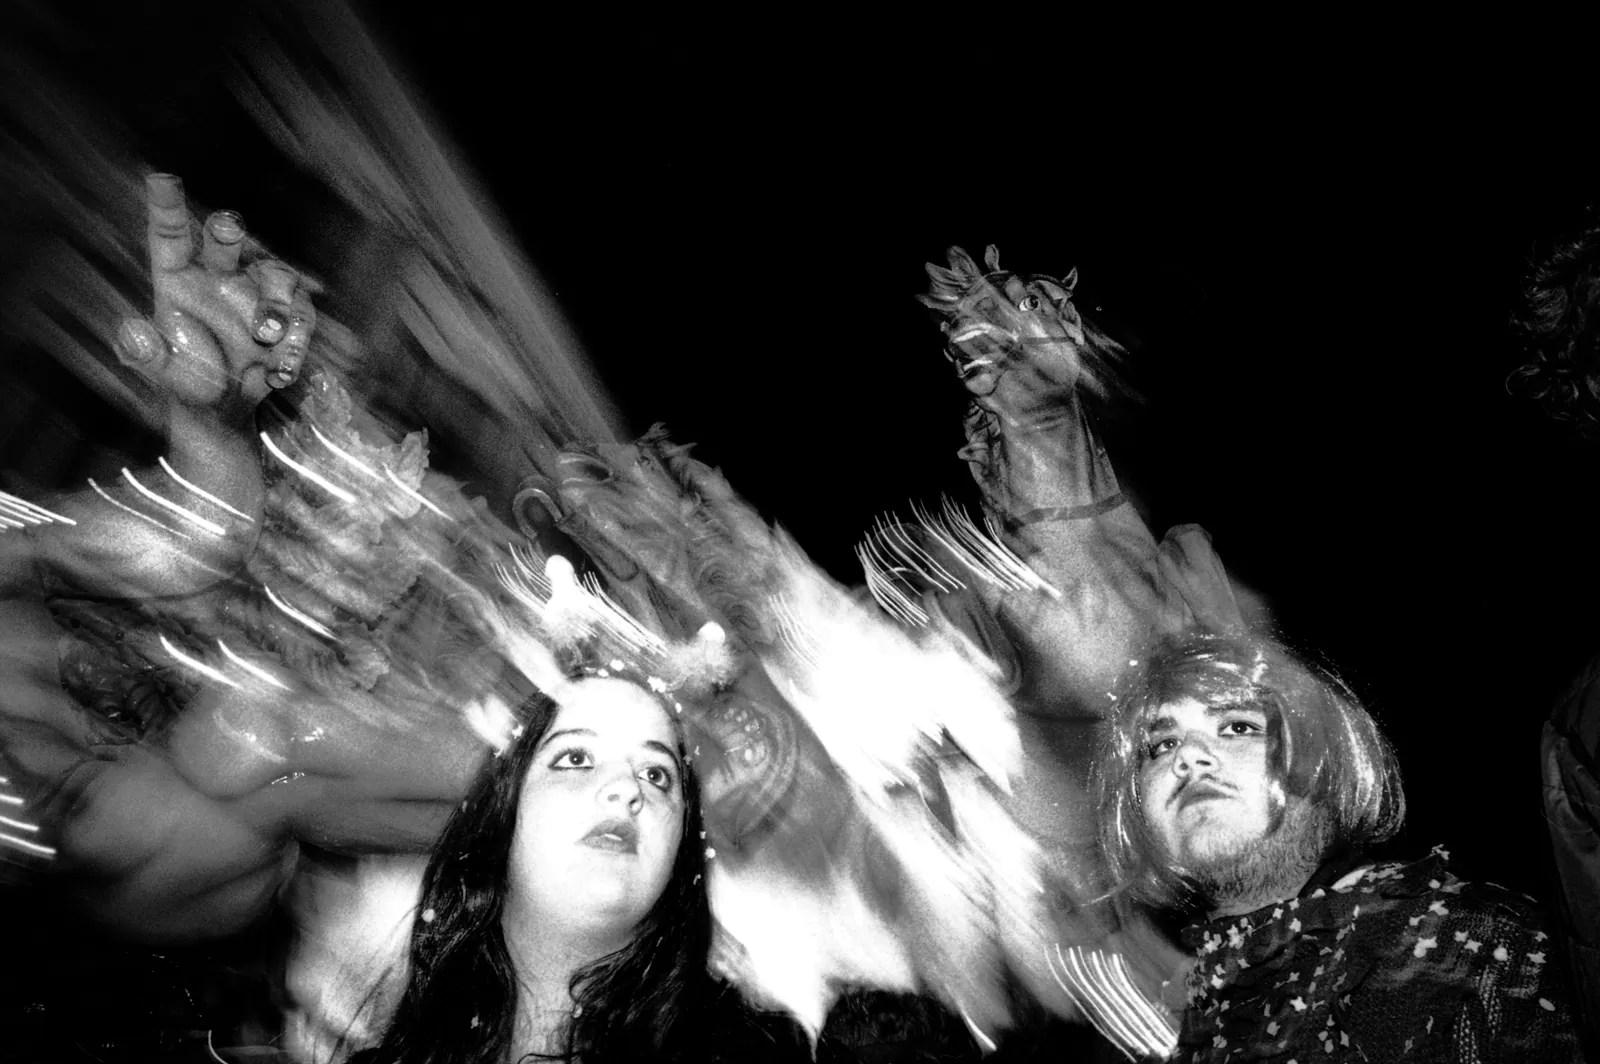 ©Andrea Scirè - Leica M6 - 21mm Voigtlander - Kodak Trix400 - Flash